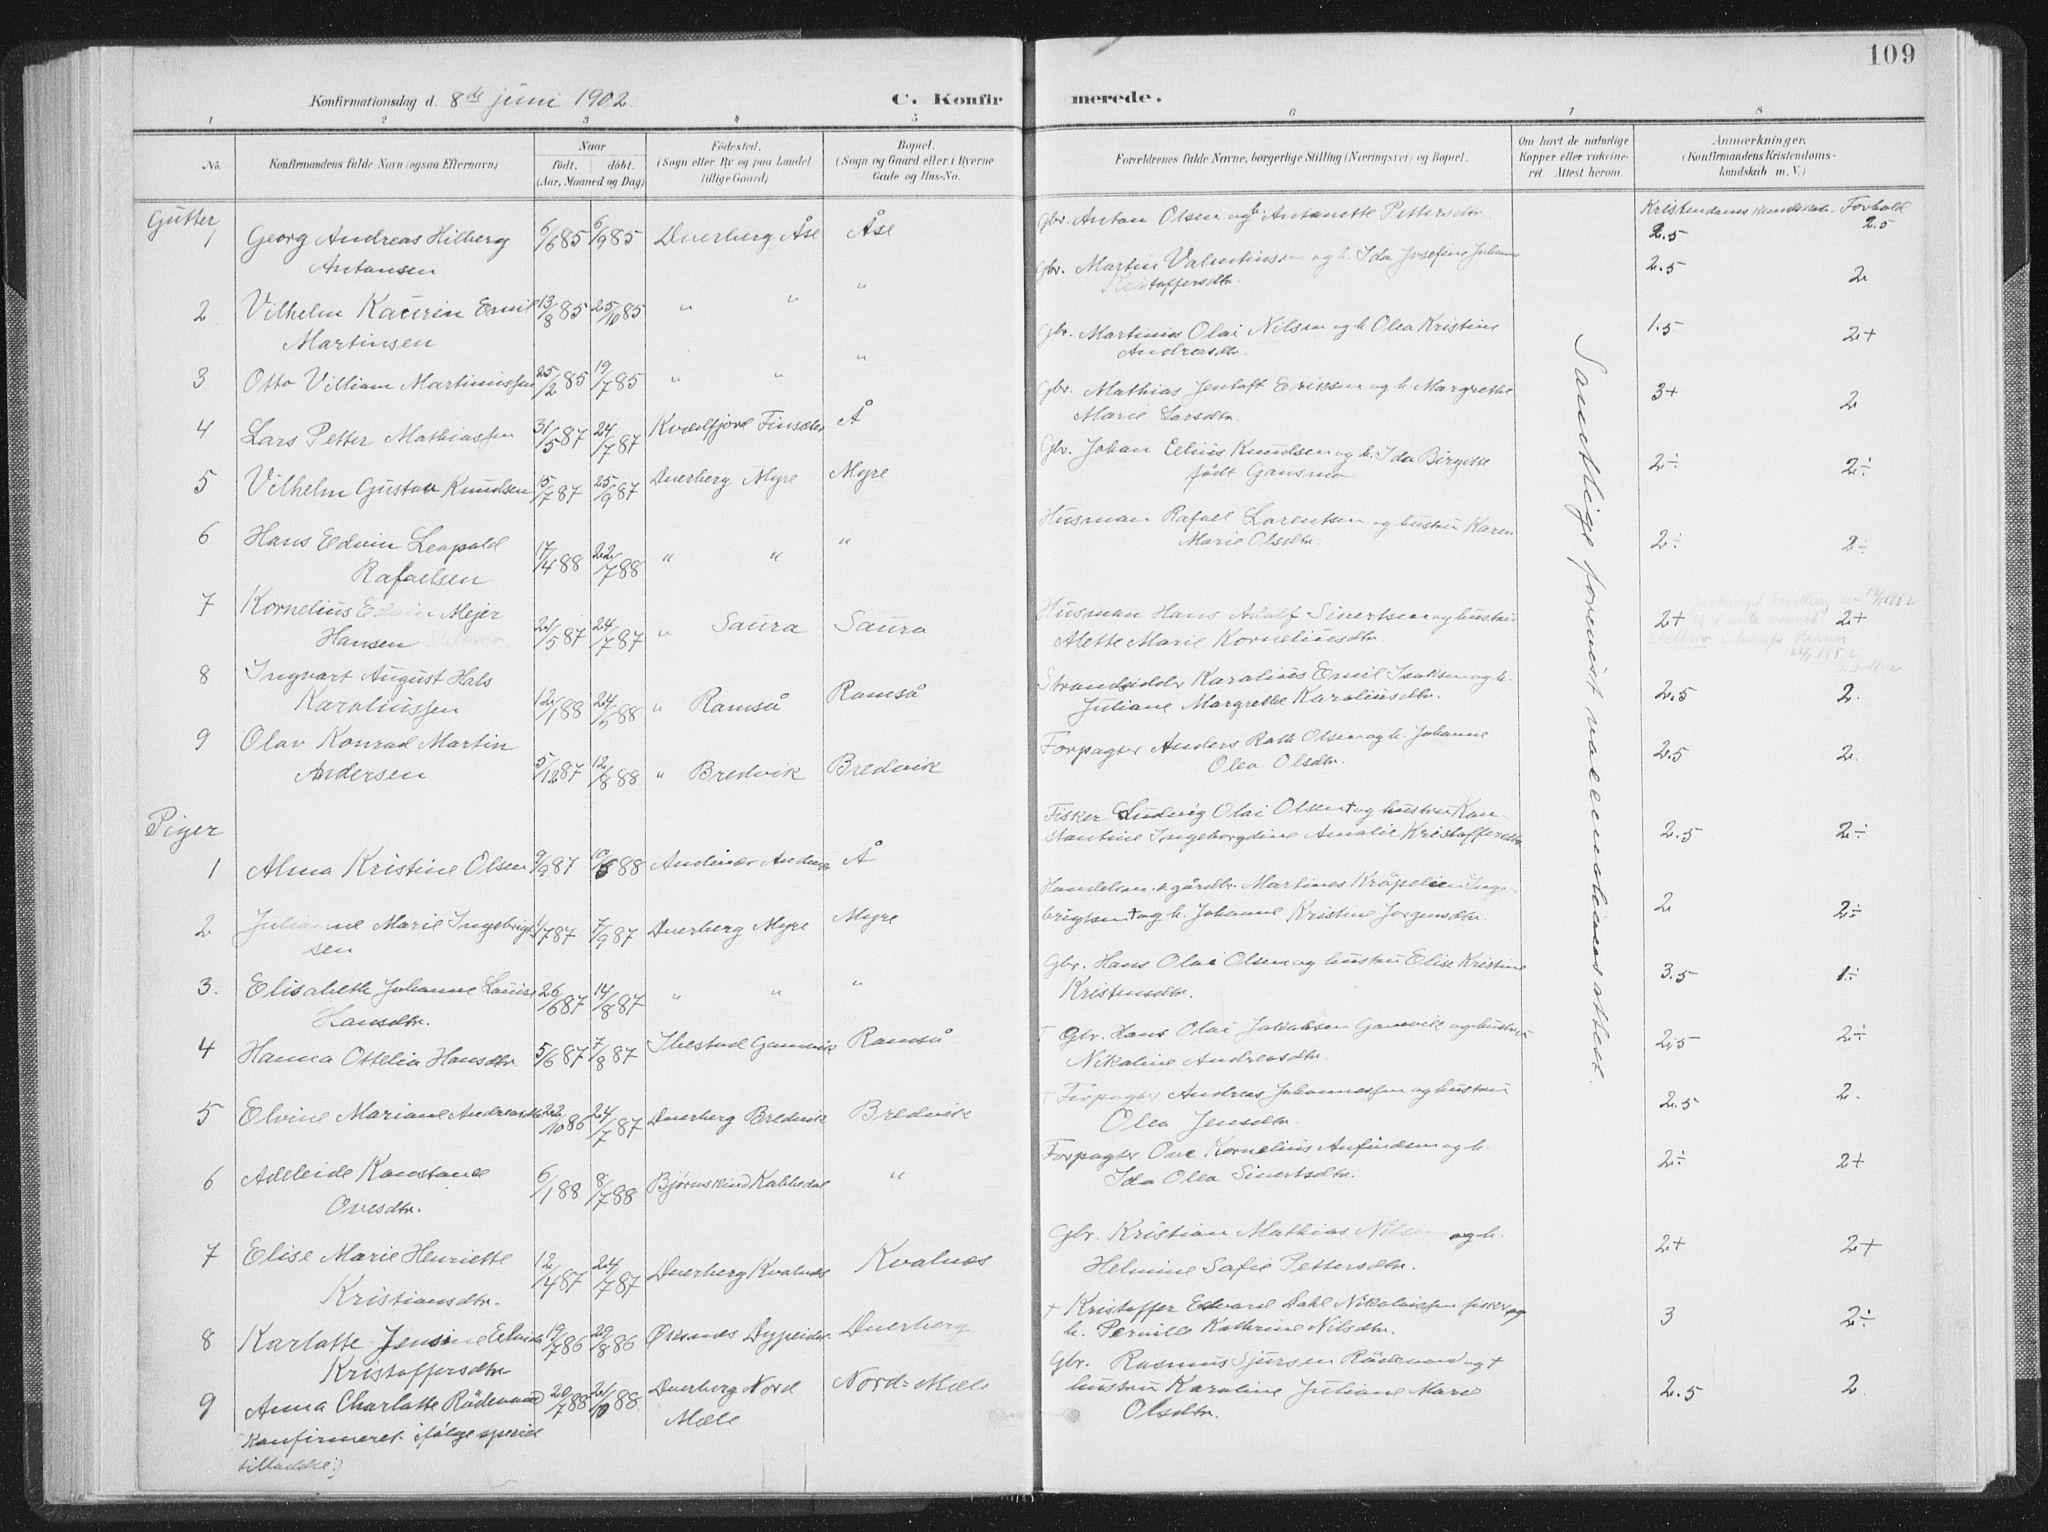 SAT, Ministerialprotokoller, klokkerbøker og fødselsregistre - Nordland, 897/L1400: Ministerialbok nr. 897A07, 1897-1908, s. 109